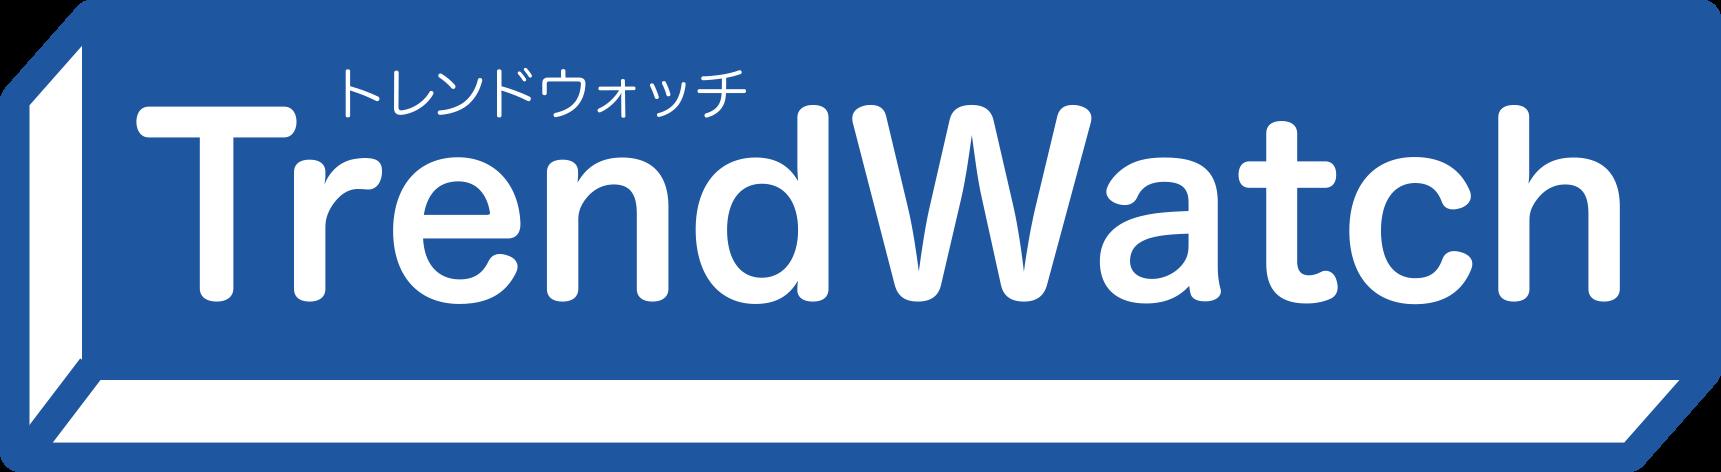 TrendWatch トレンドウォッチ